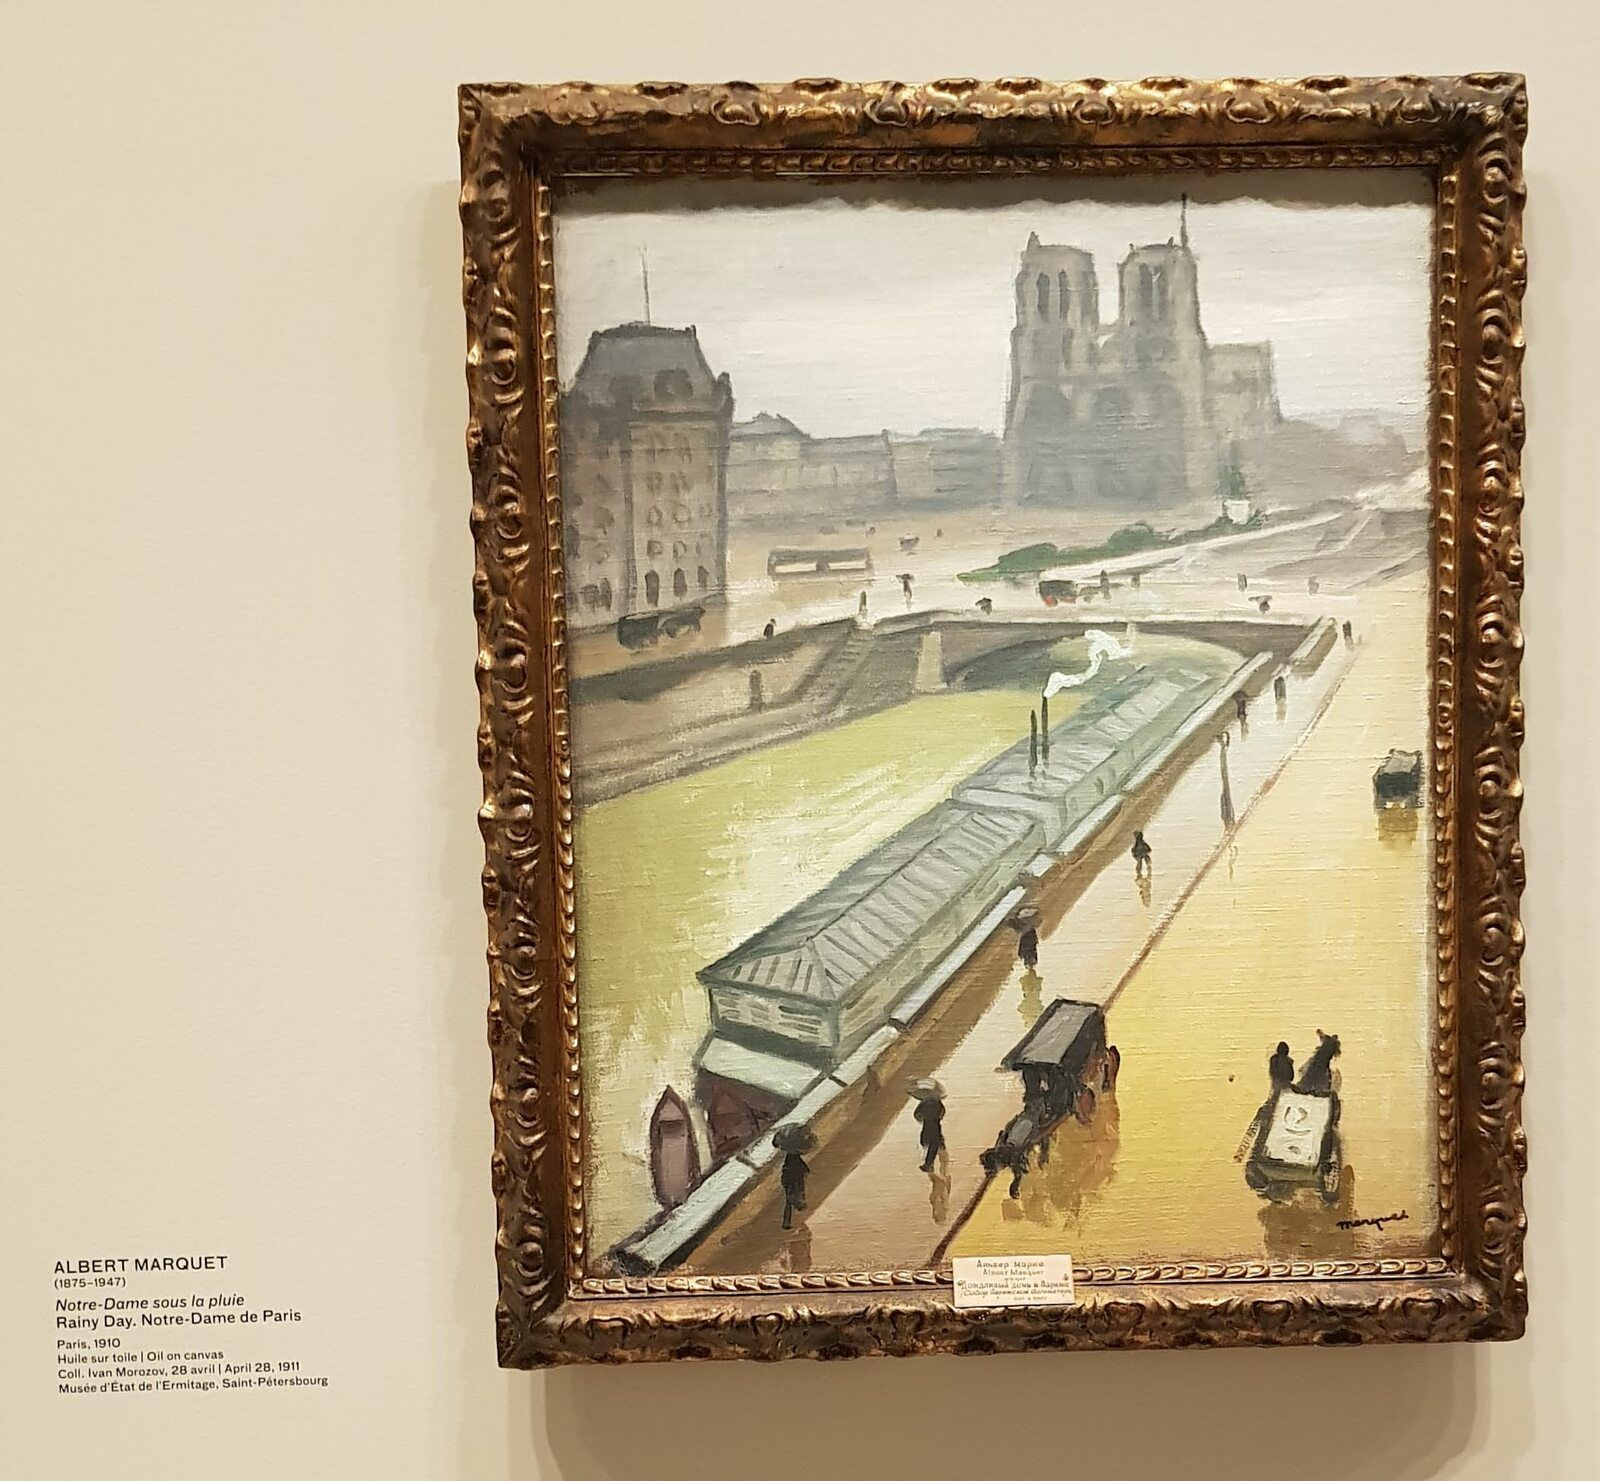 Collection Morozov fondation Vuitton